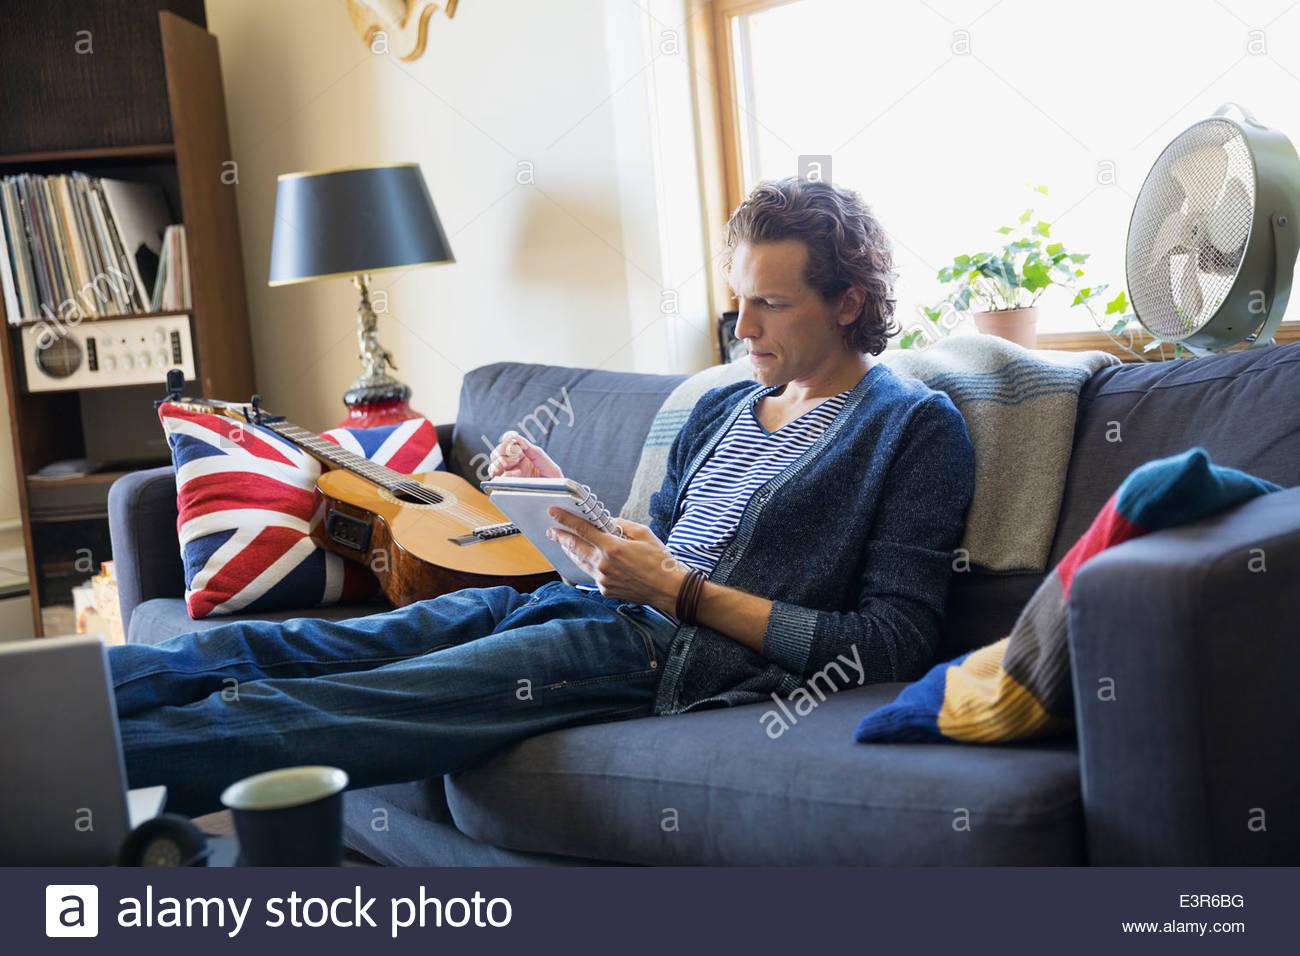 Man with guitar writing music on sofa - Stock Image